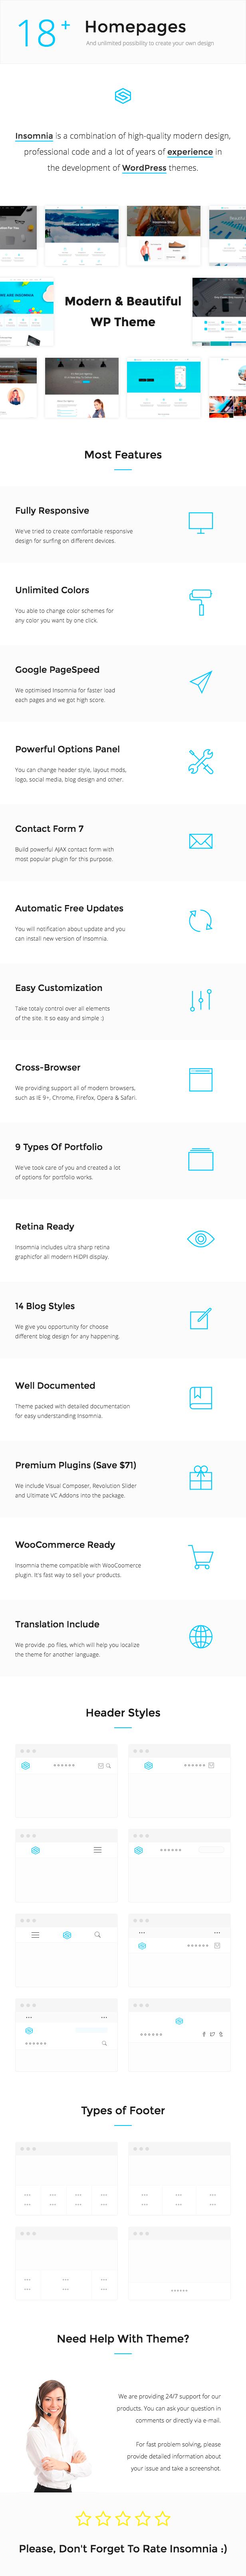 Insomnia - Beautiful and Modern Creative WordPress Theme